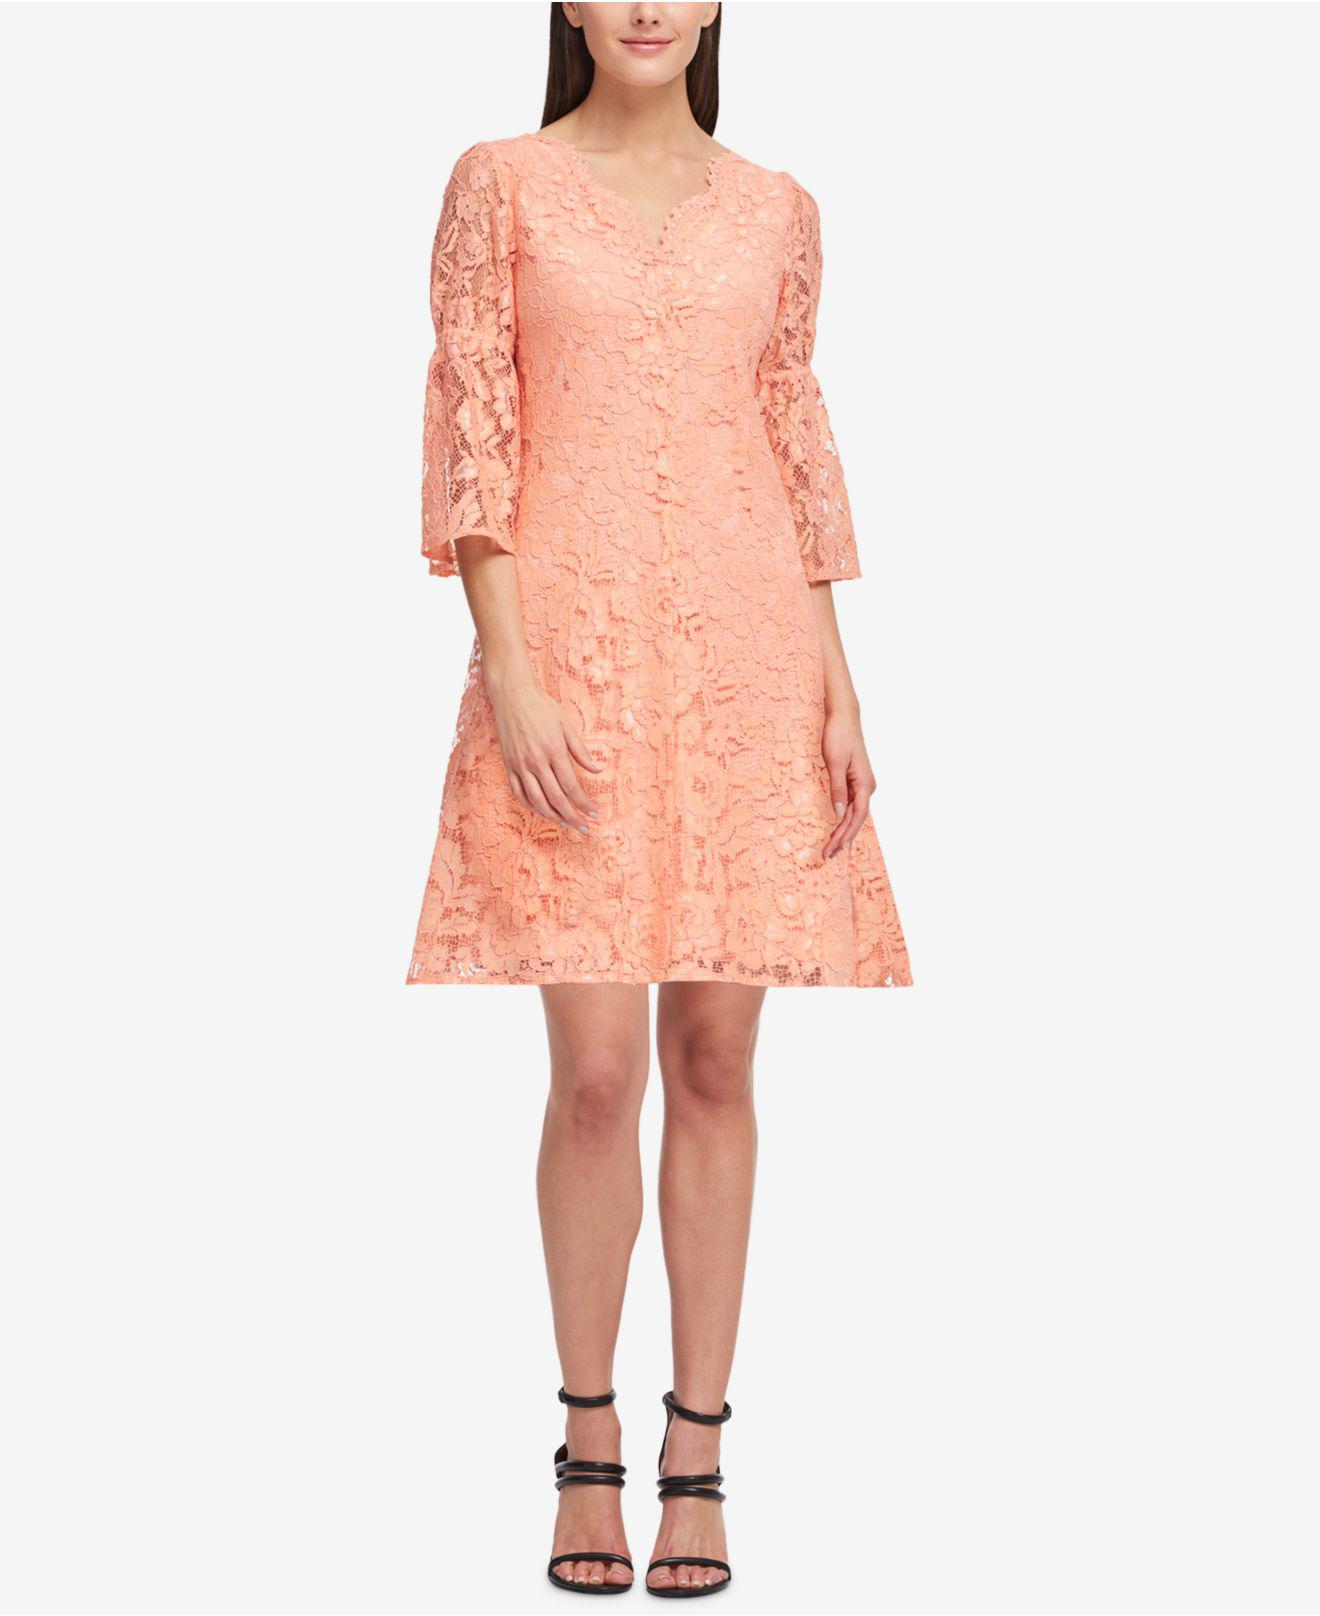 8b9bab94c544 Macys Pink Lace Dress